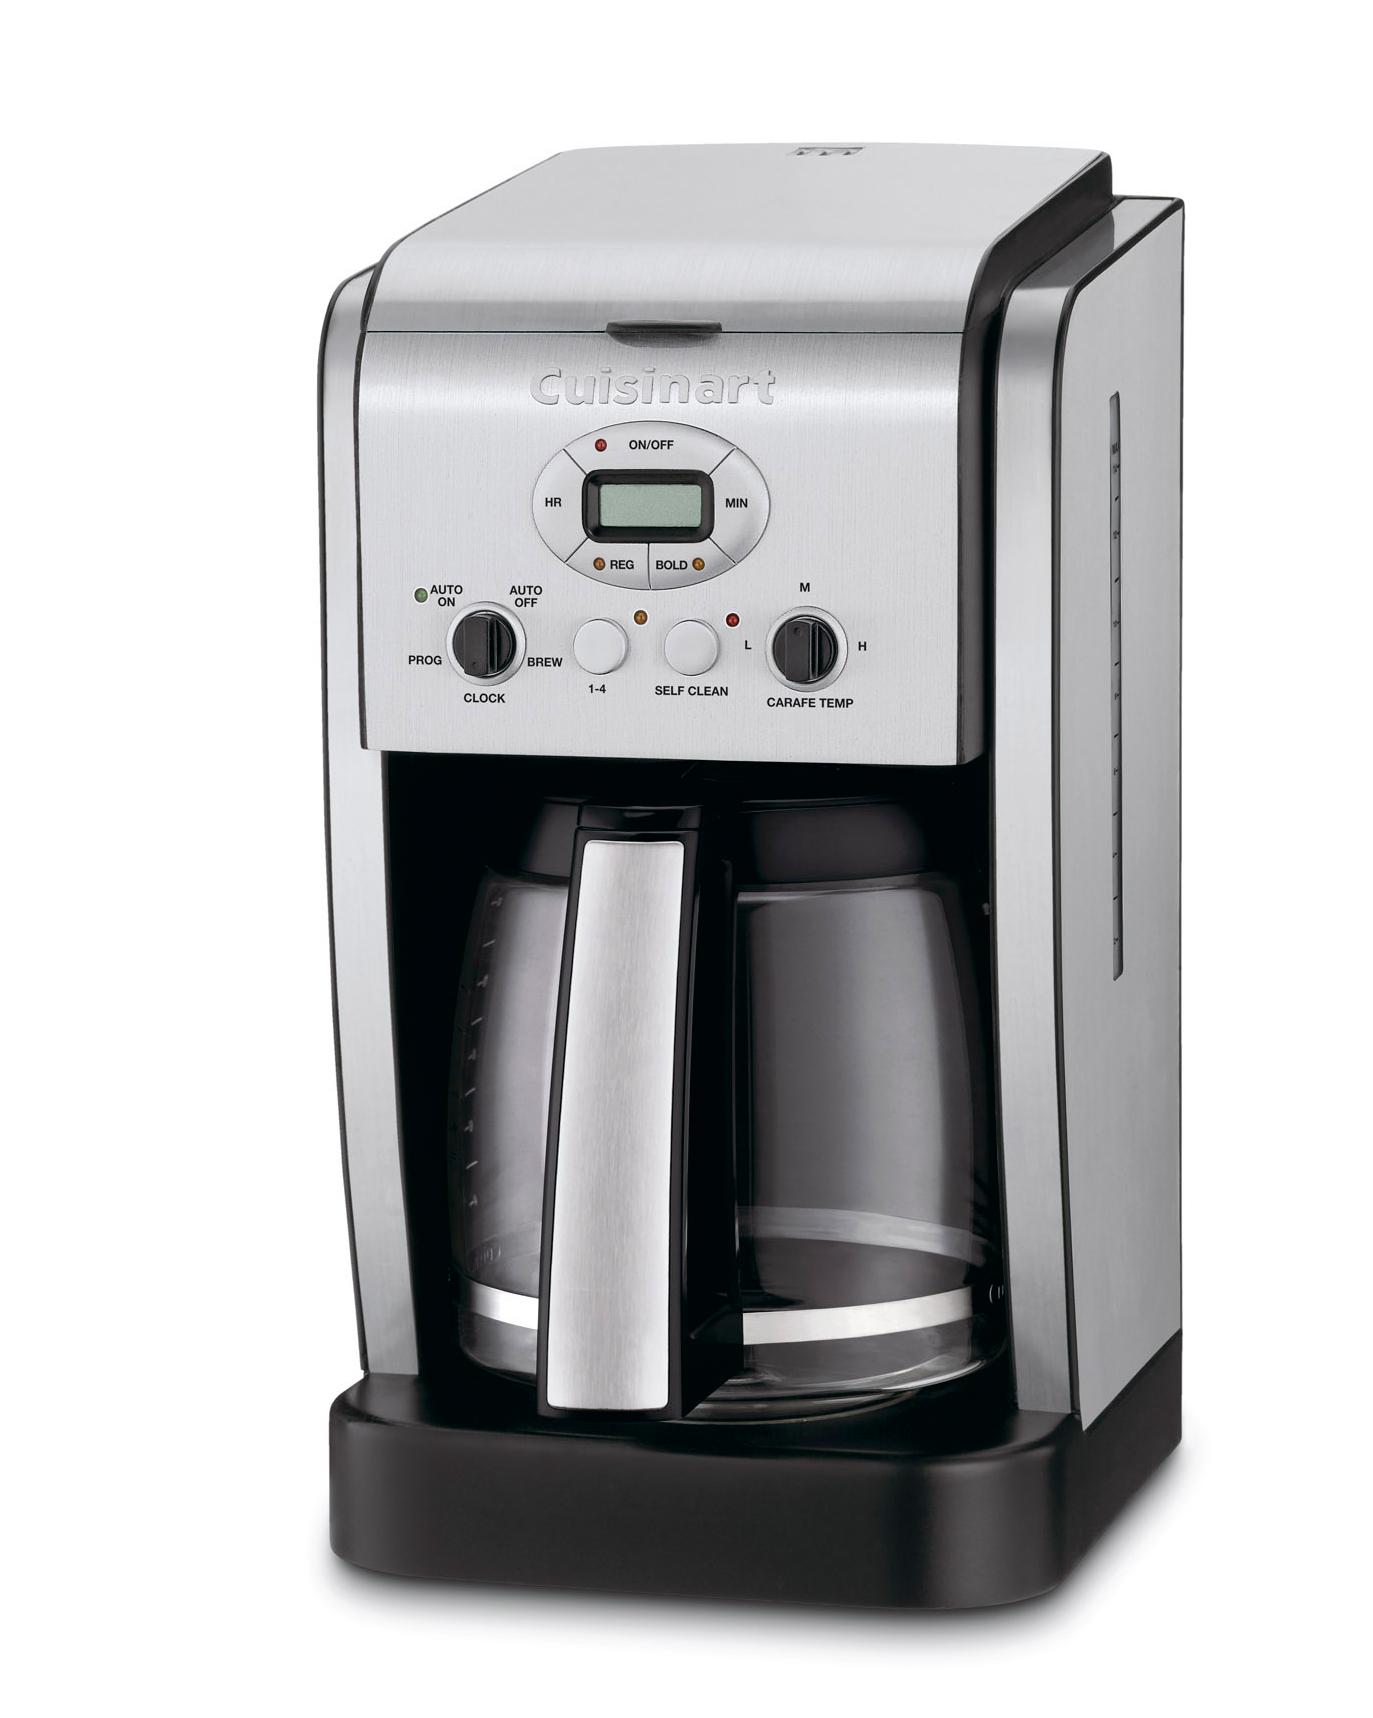 coffee-makers-registry-cuisinart-extreme-brew-0914.jpg